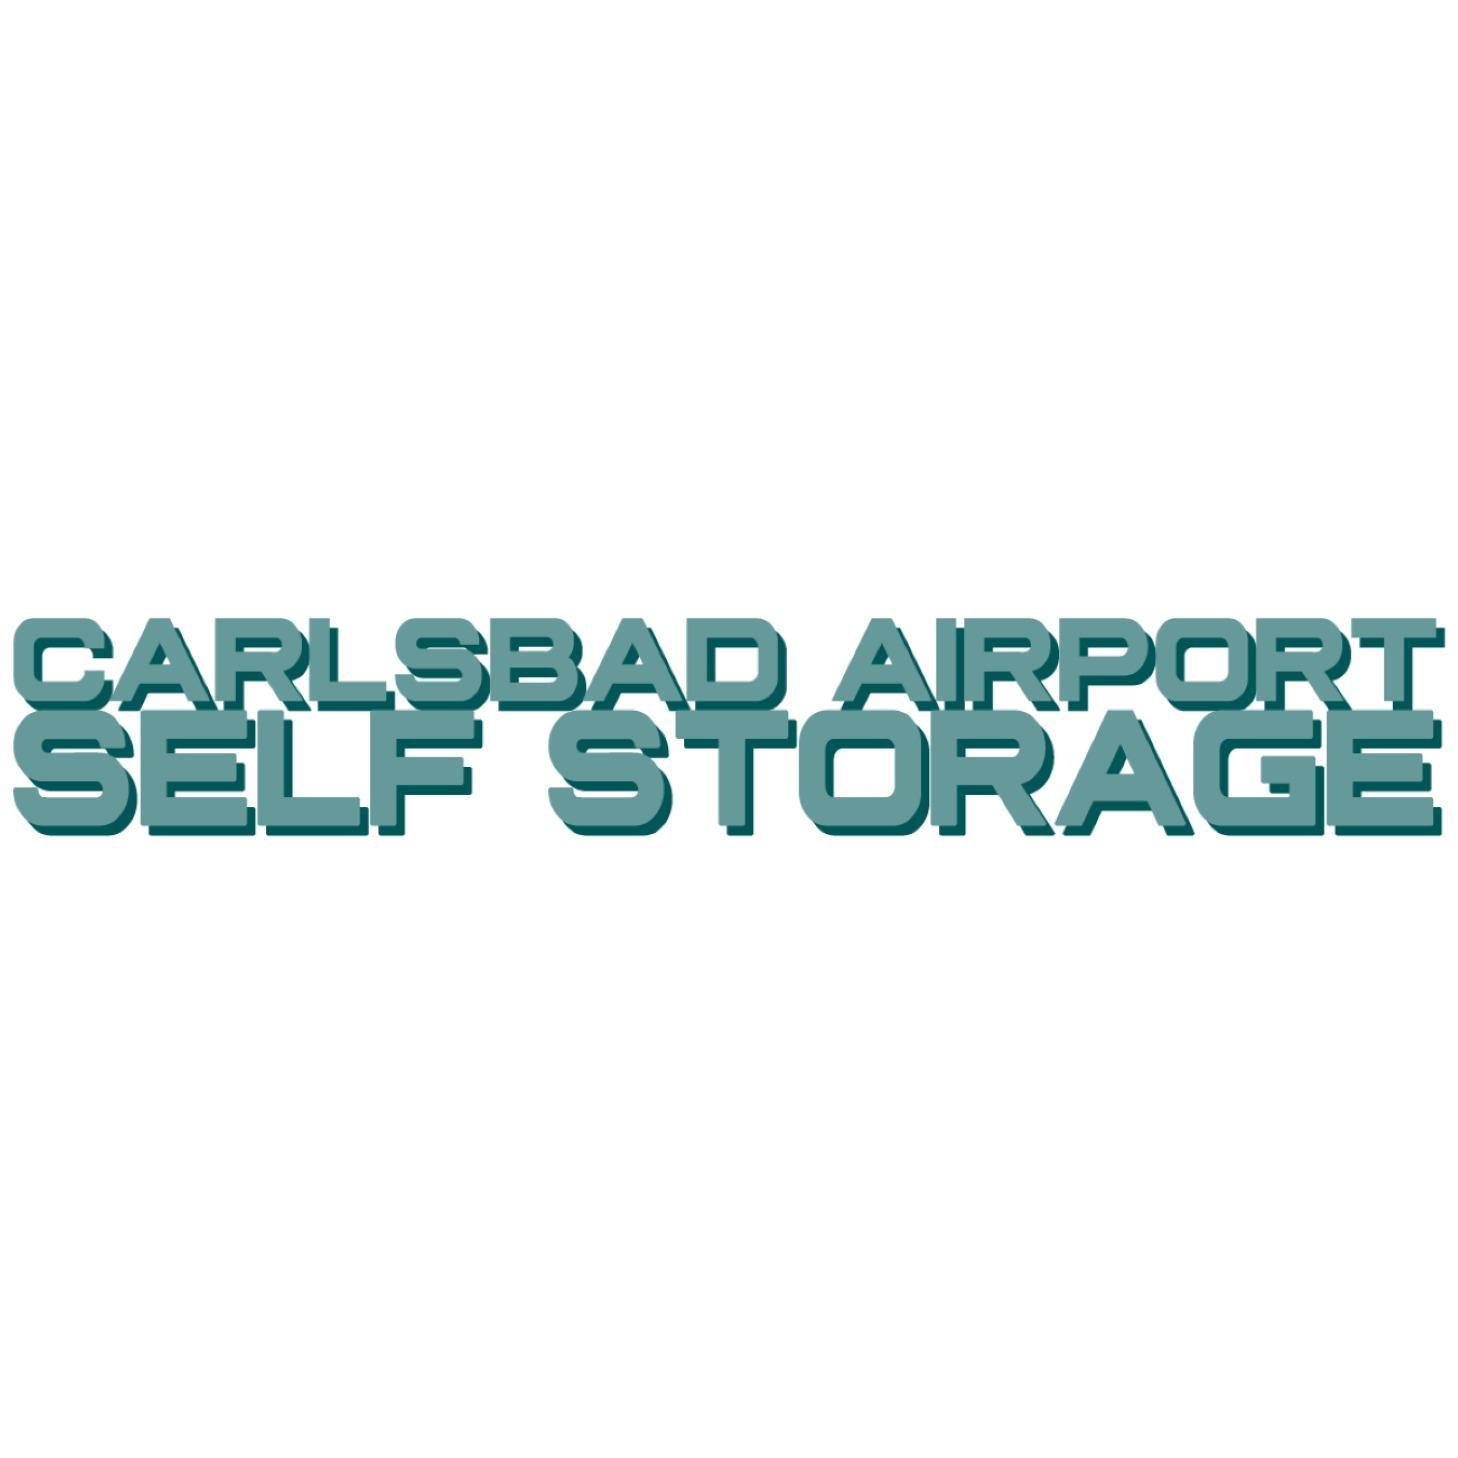 Carlsbad Airport Self Storage